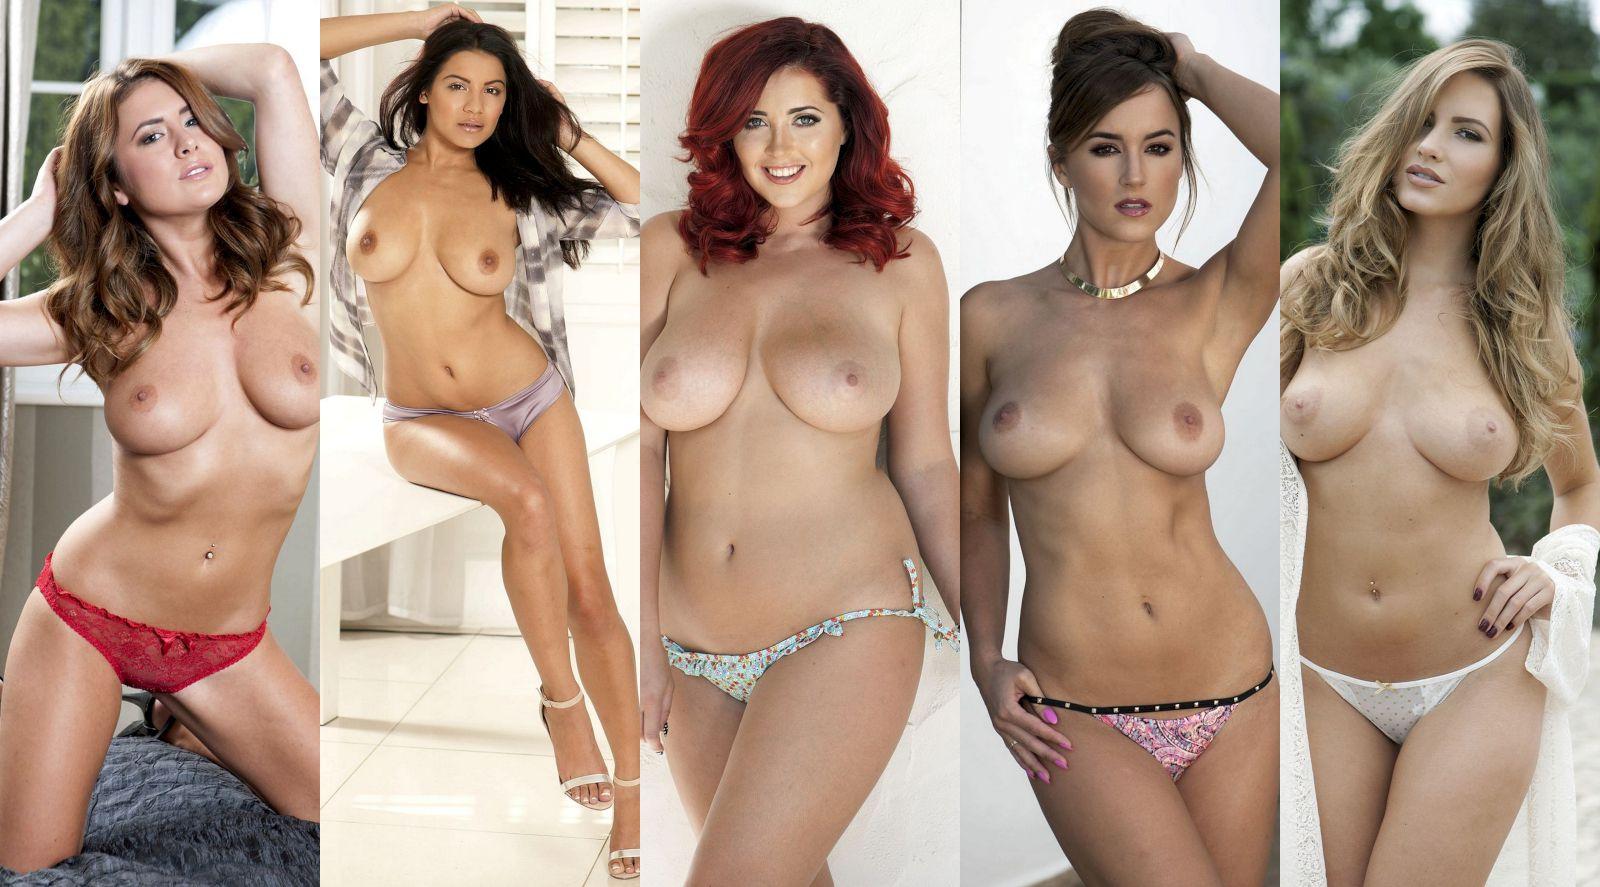 Pin on nearly naked women